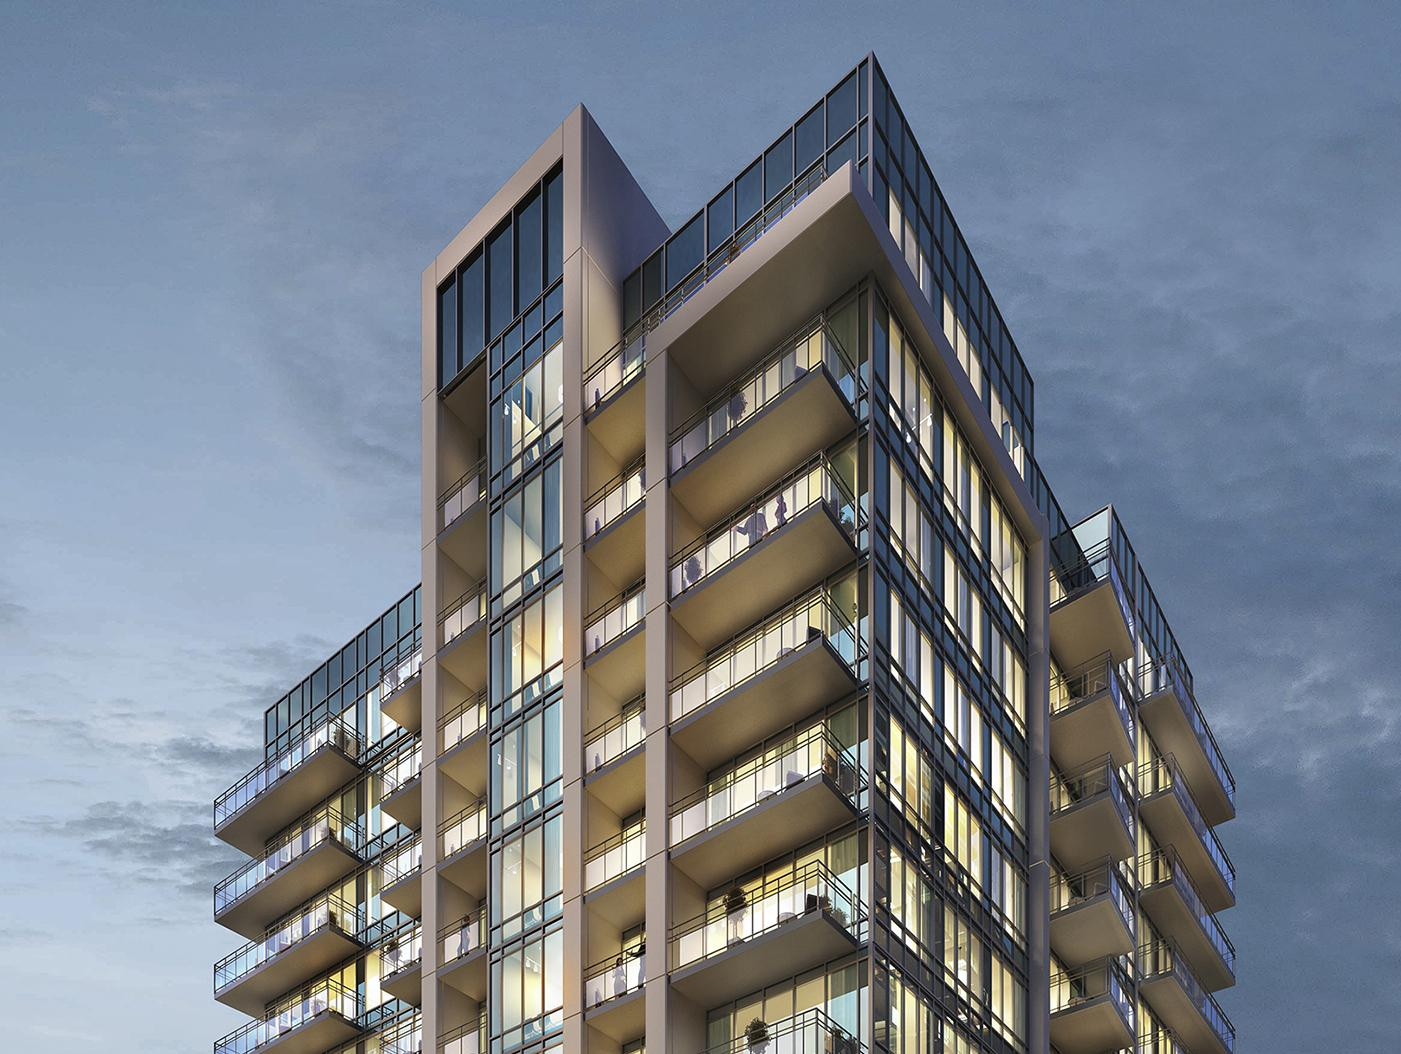 Bayview Ave & Sheppard Ave E,Toronto,Canada,New Condo Projects,Bayview Ave & Sheppard Ave E,1122